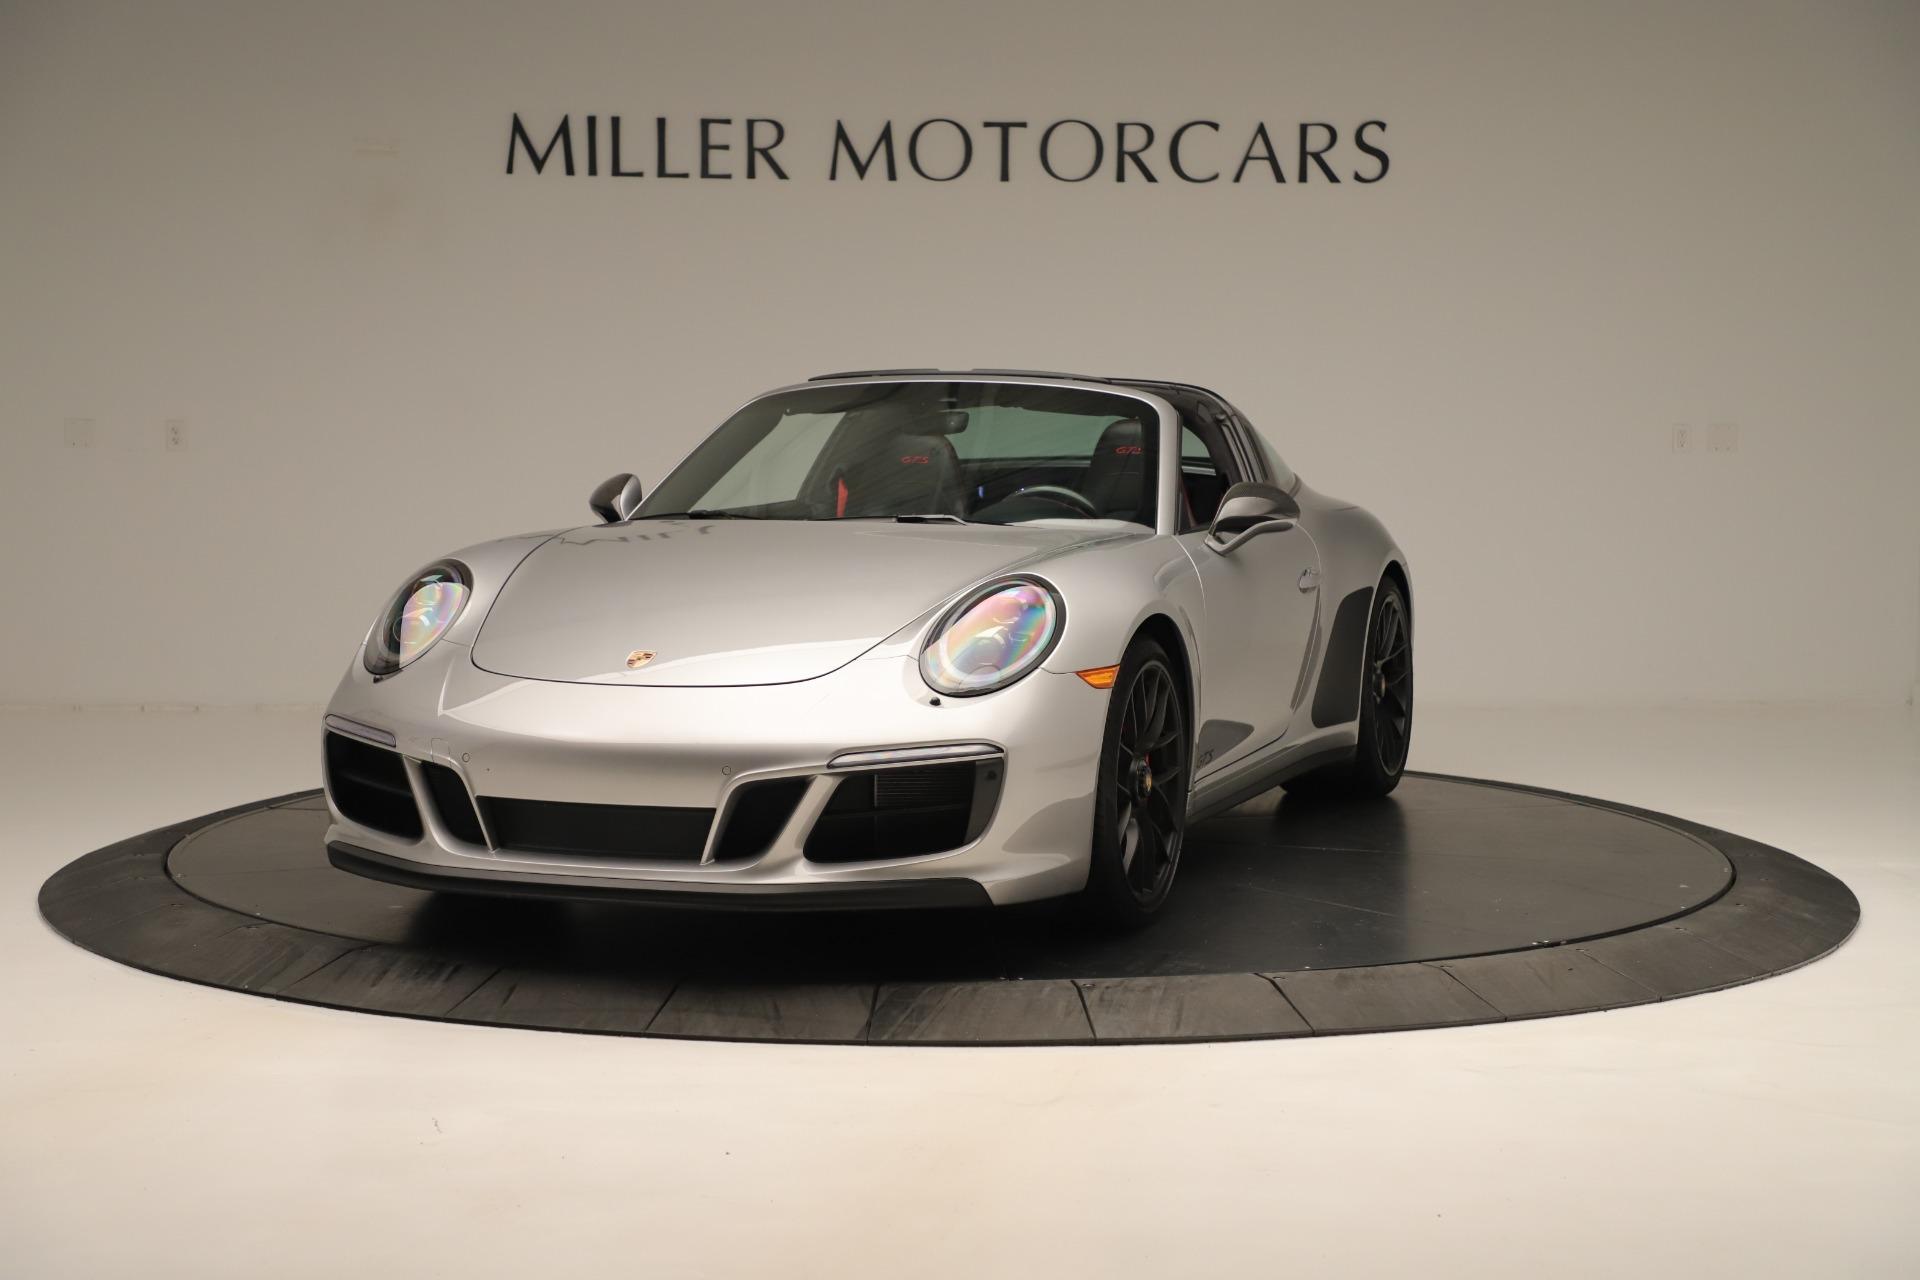 Used 2017 Porsche 911 Targa 4 GTS For Sale In Greenwich, CT 3374_main